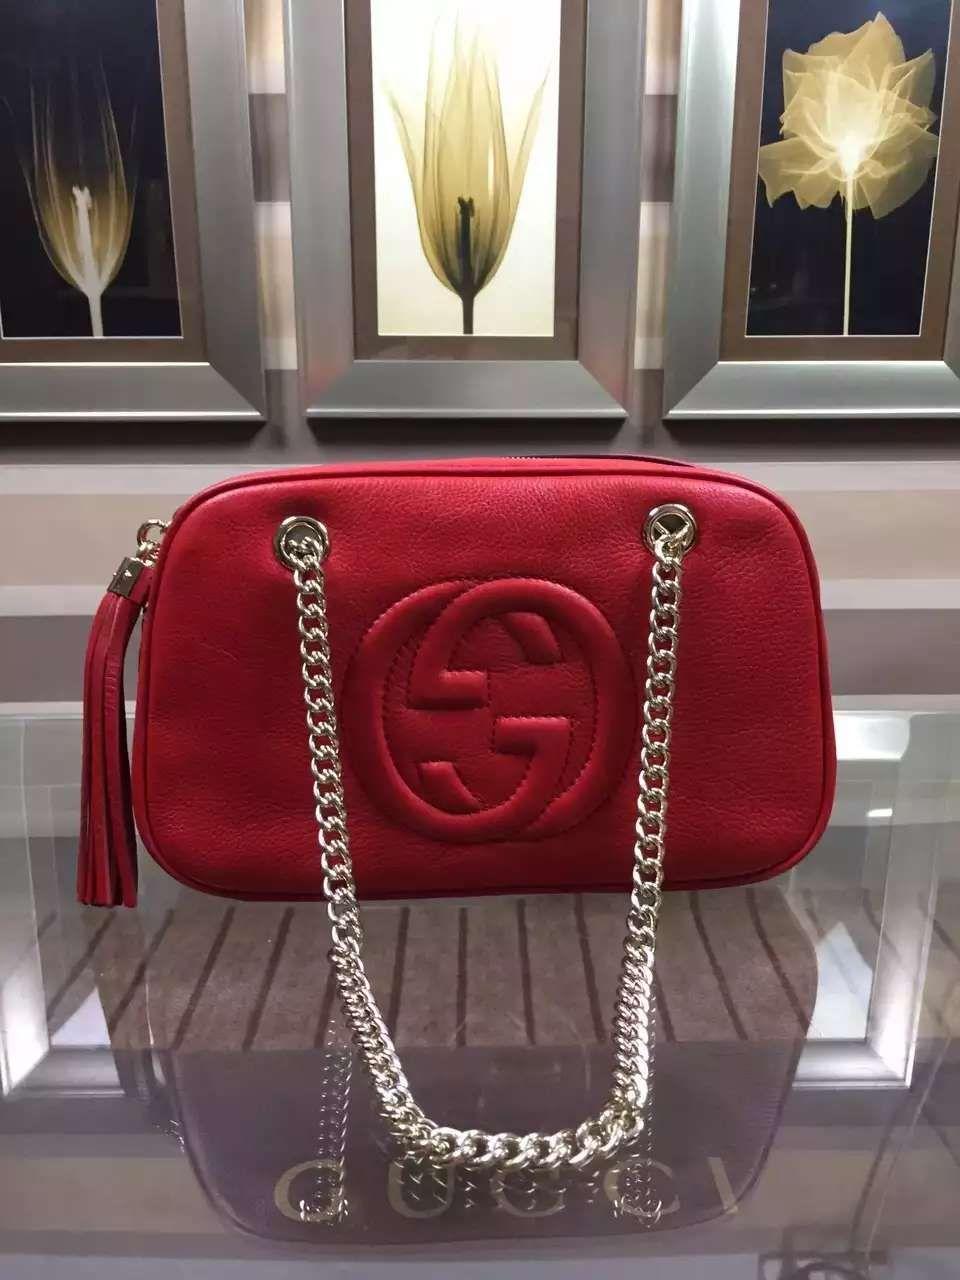 gucci Bag, ID : 46701(FORSALE:a@yybags.com), gucci leather briefcase for women, gucci camo backpack, gucci executive briefcase, gucci designer bags for less, gucci totes for women, gucci chicago, gucci wallet sale, gucci jessica simpson handbags, cheap gucci bag, gucci designer bags on sale, gucci bags sale online, gucci black leather purse #gucciBag #gucci #designer #for #gucci